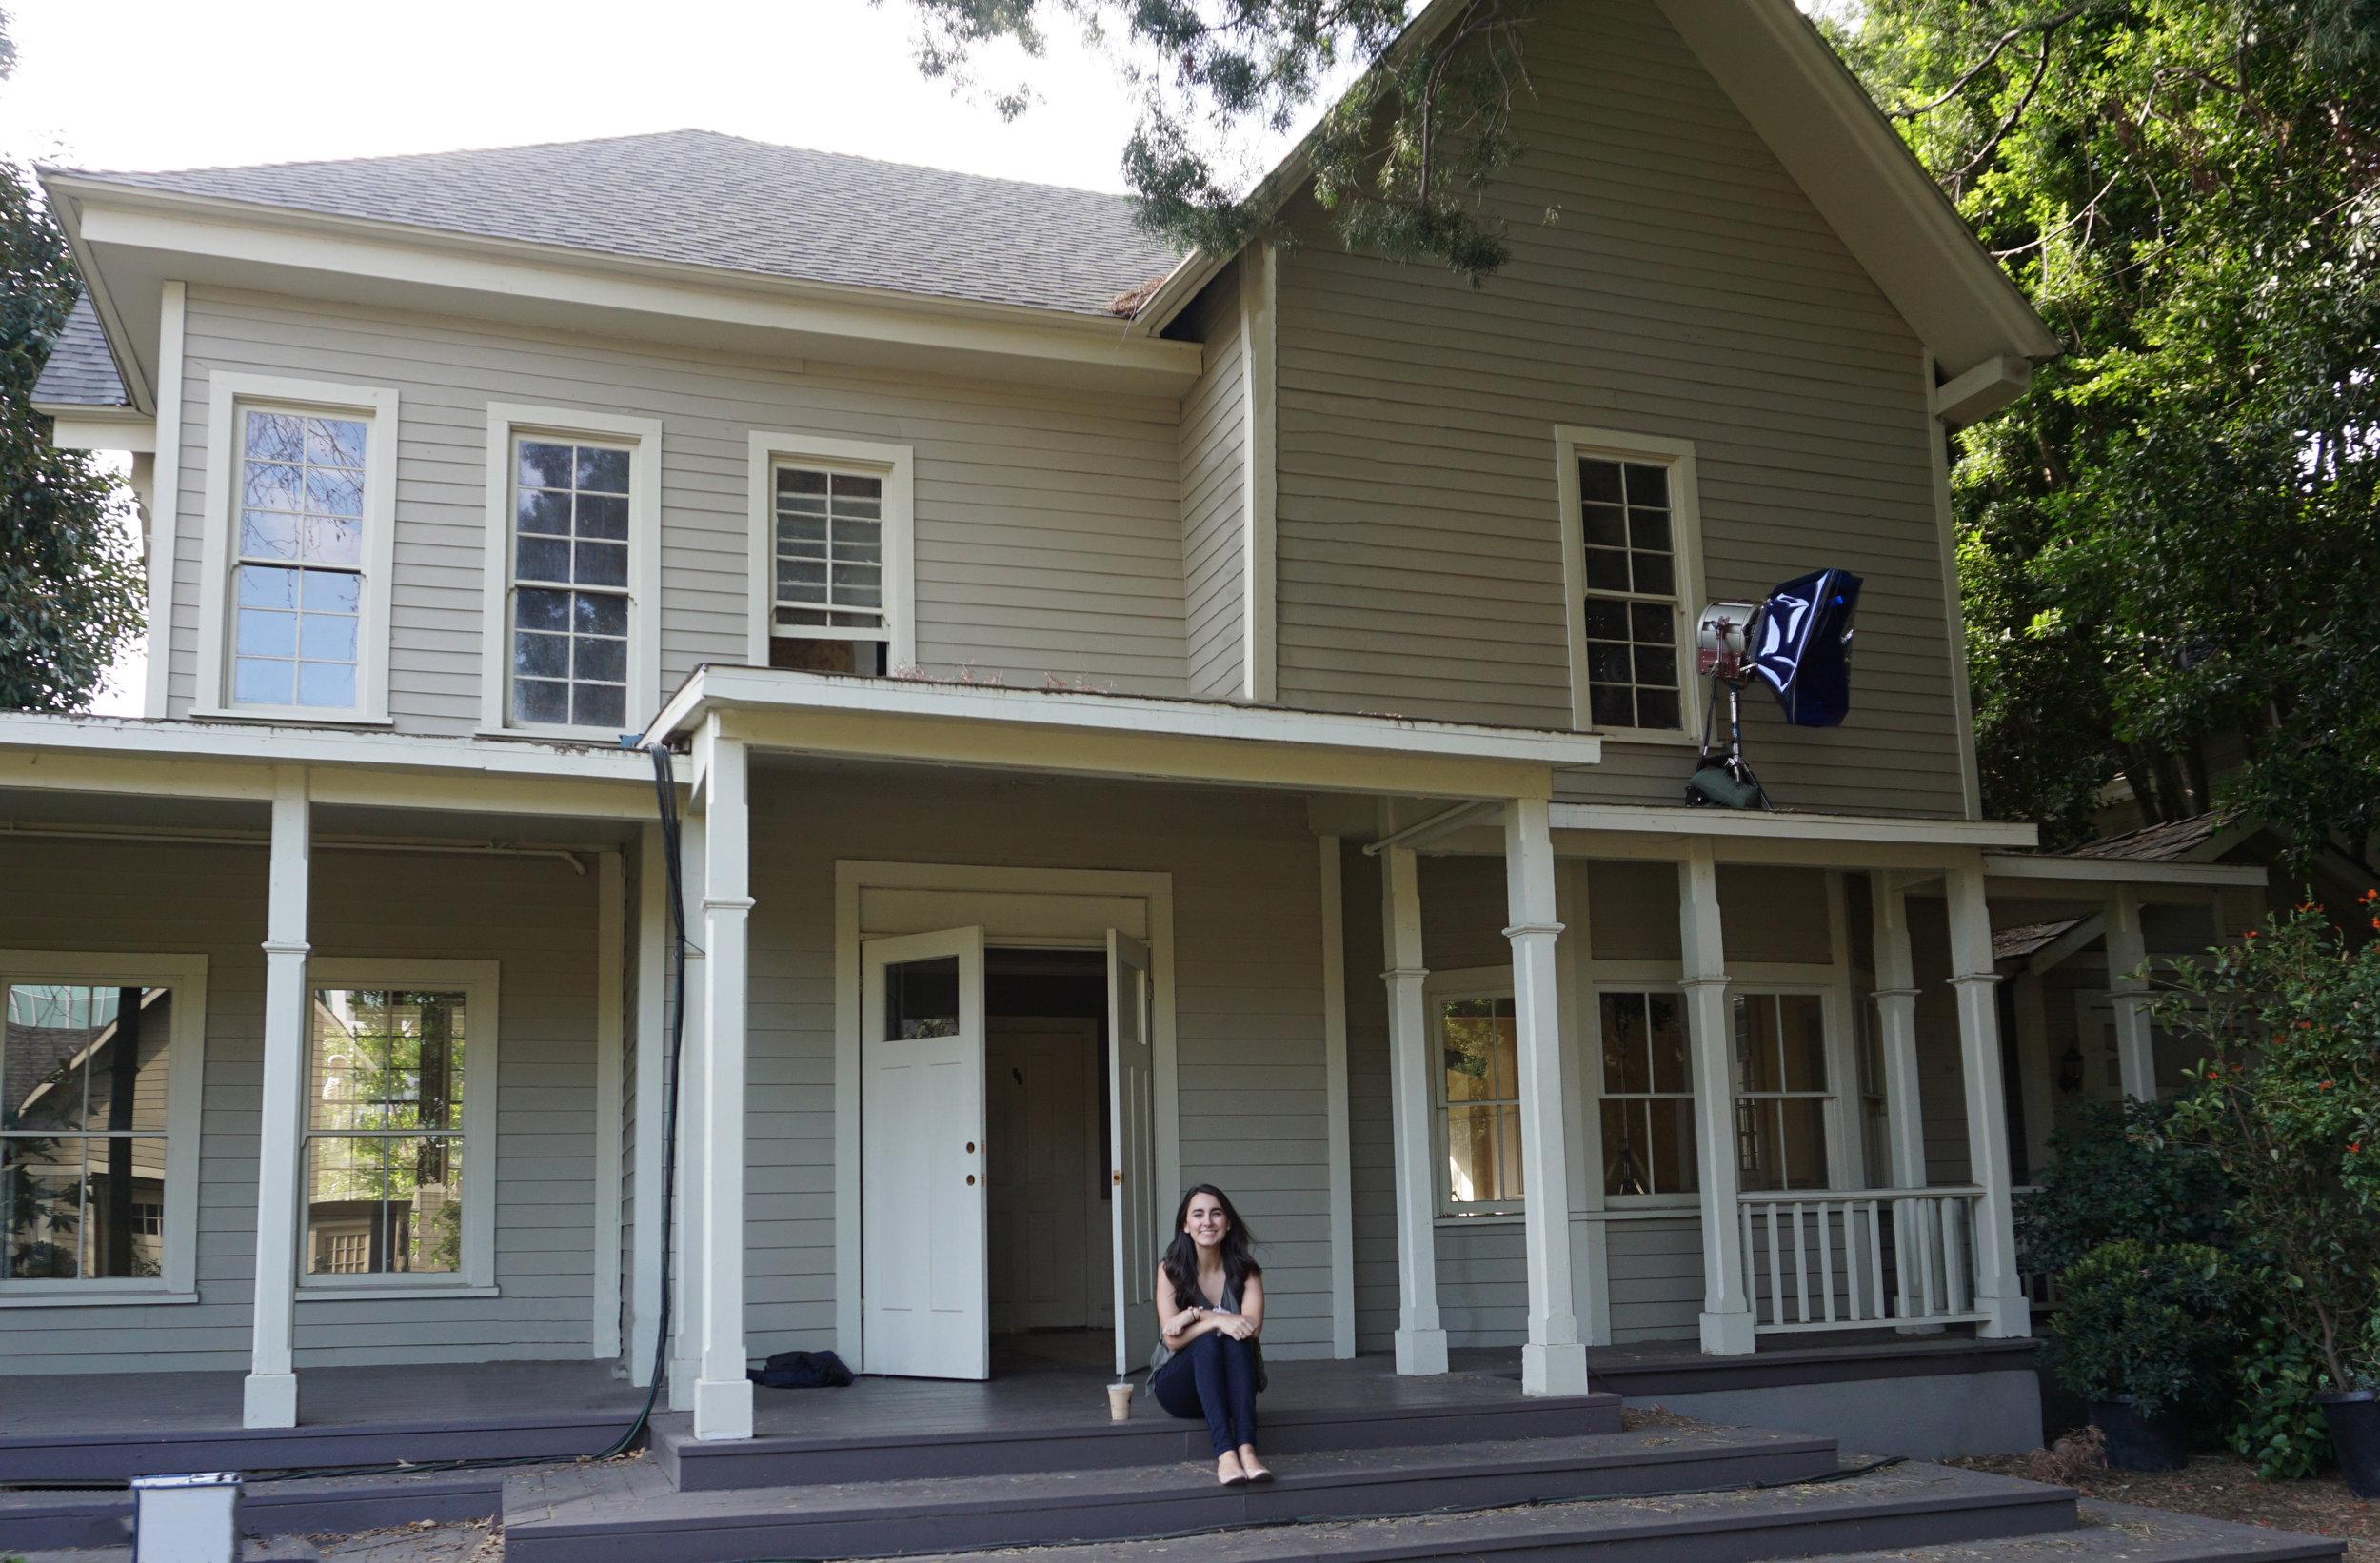 Lorelai's House - AVintageJoy